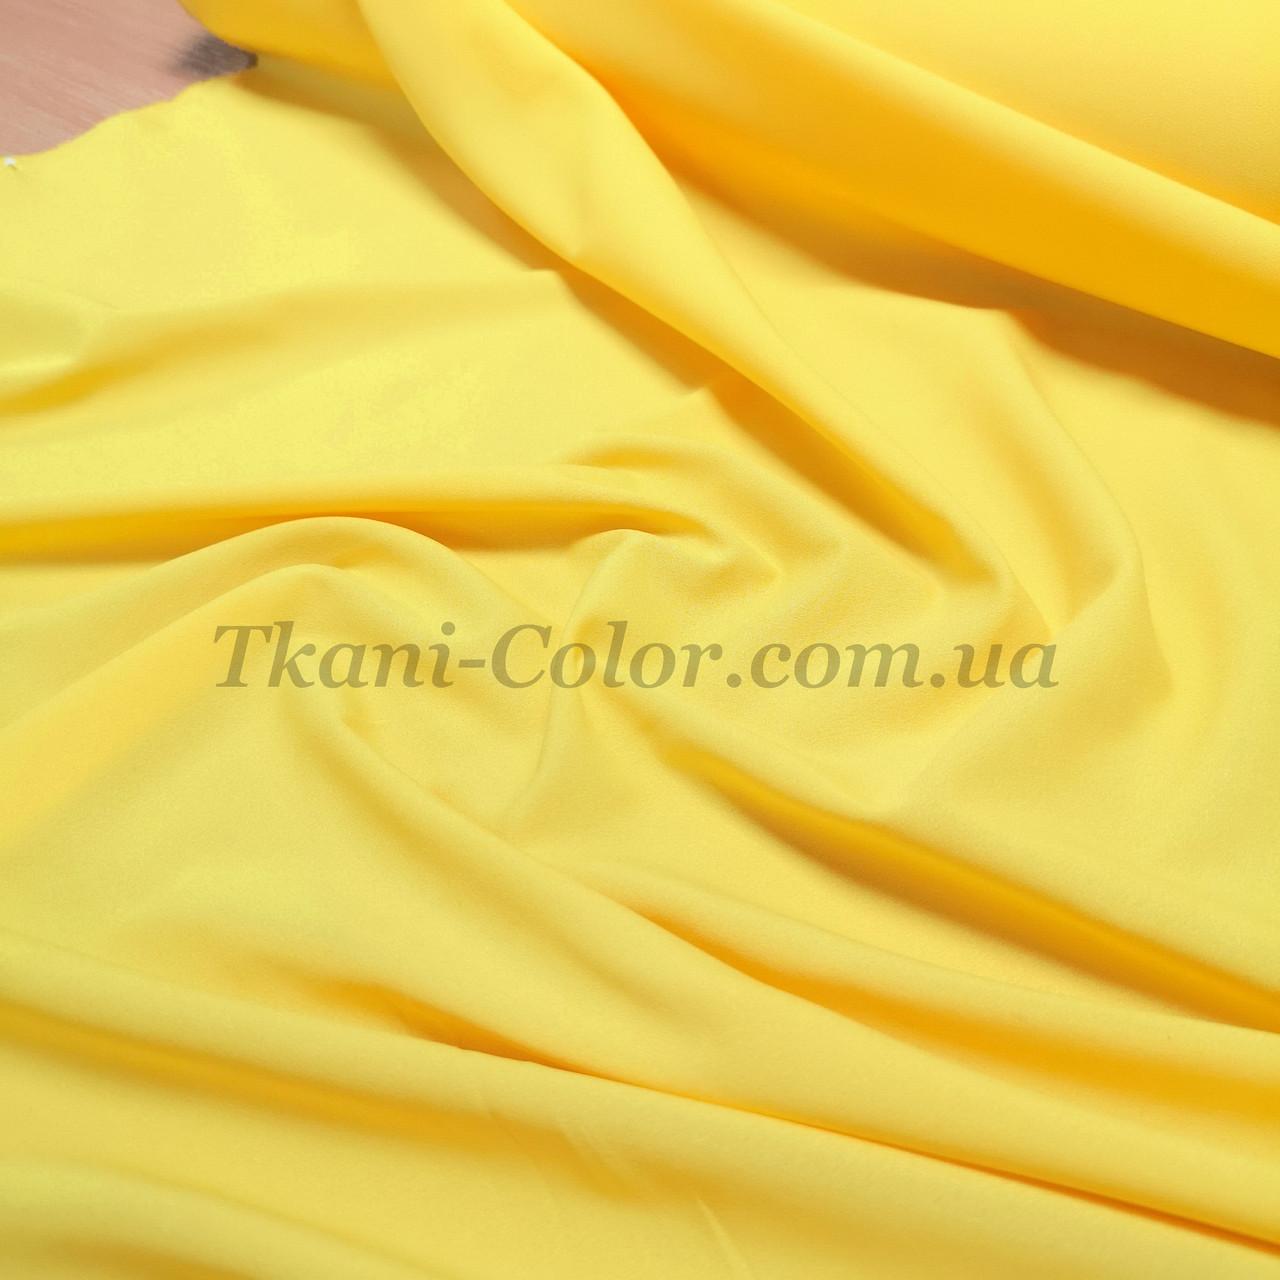 Тканина креп-шифон жовтий